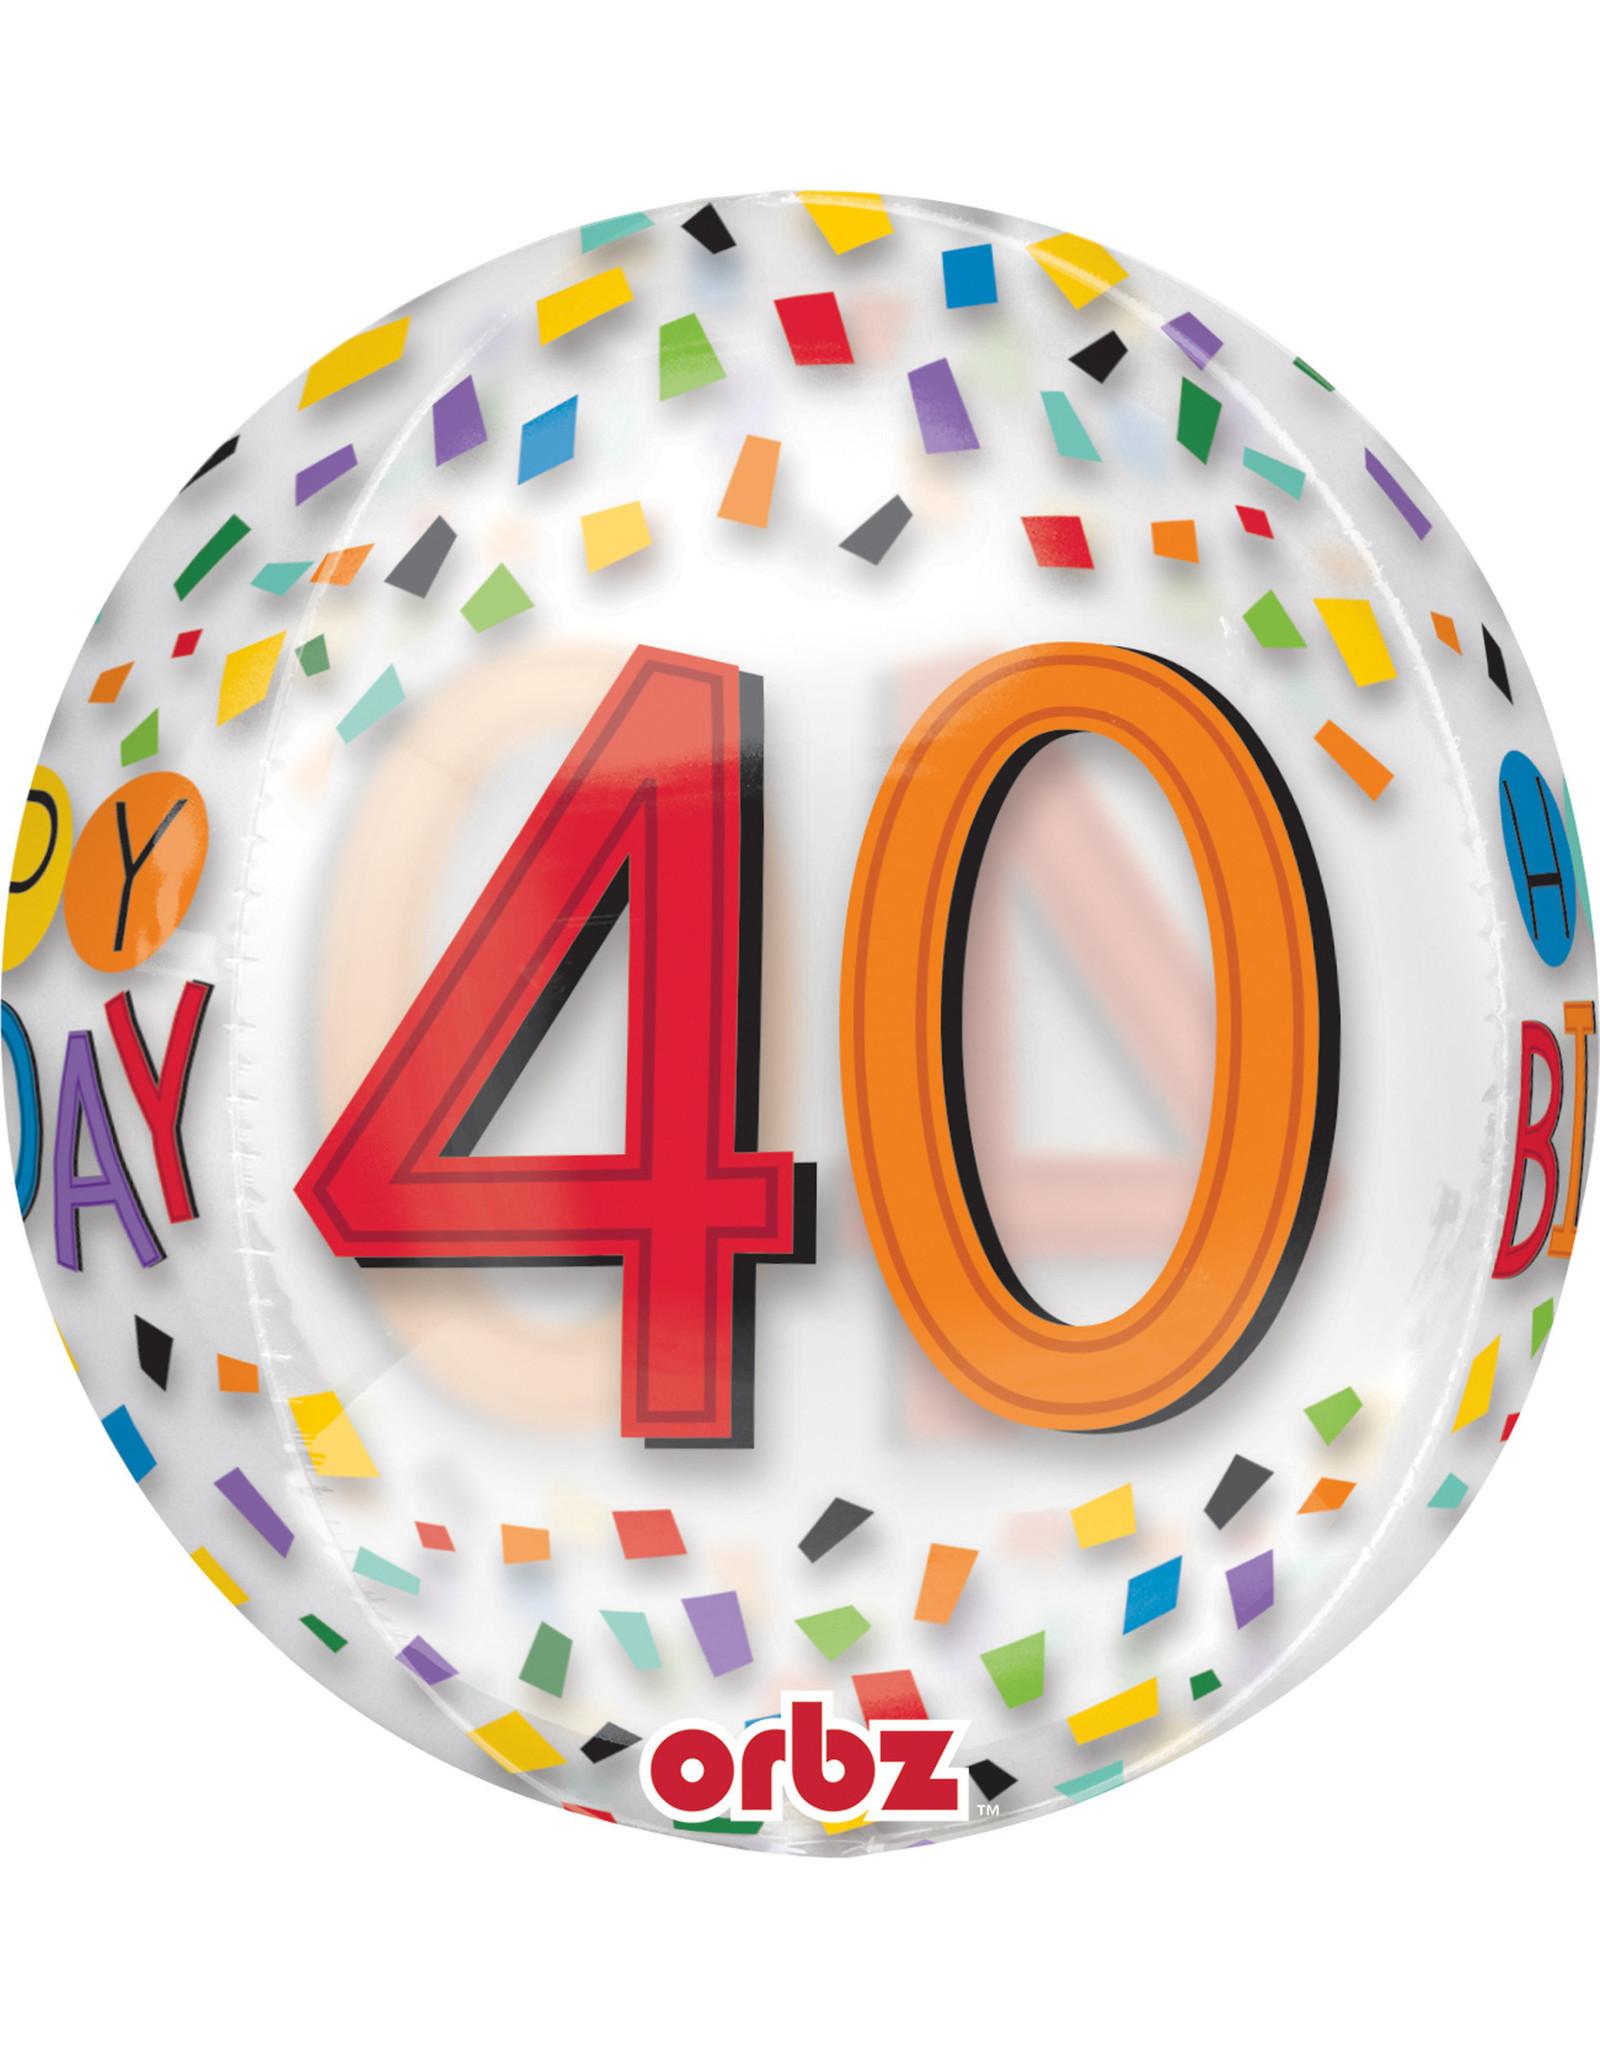 Amscan folieballon orbz confetti stijl 40 jaar 38 x 40 cm